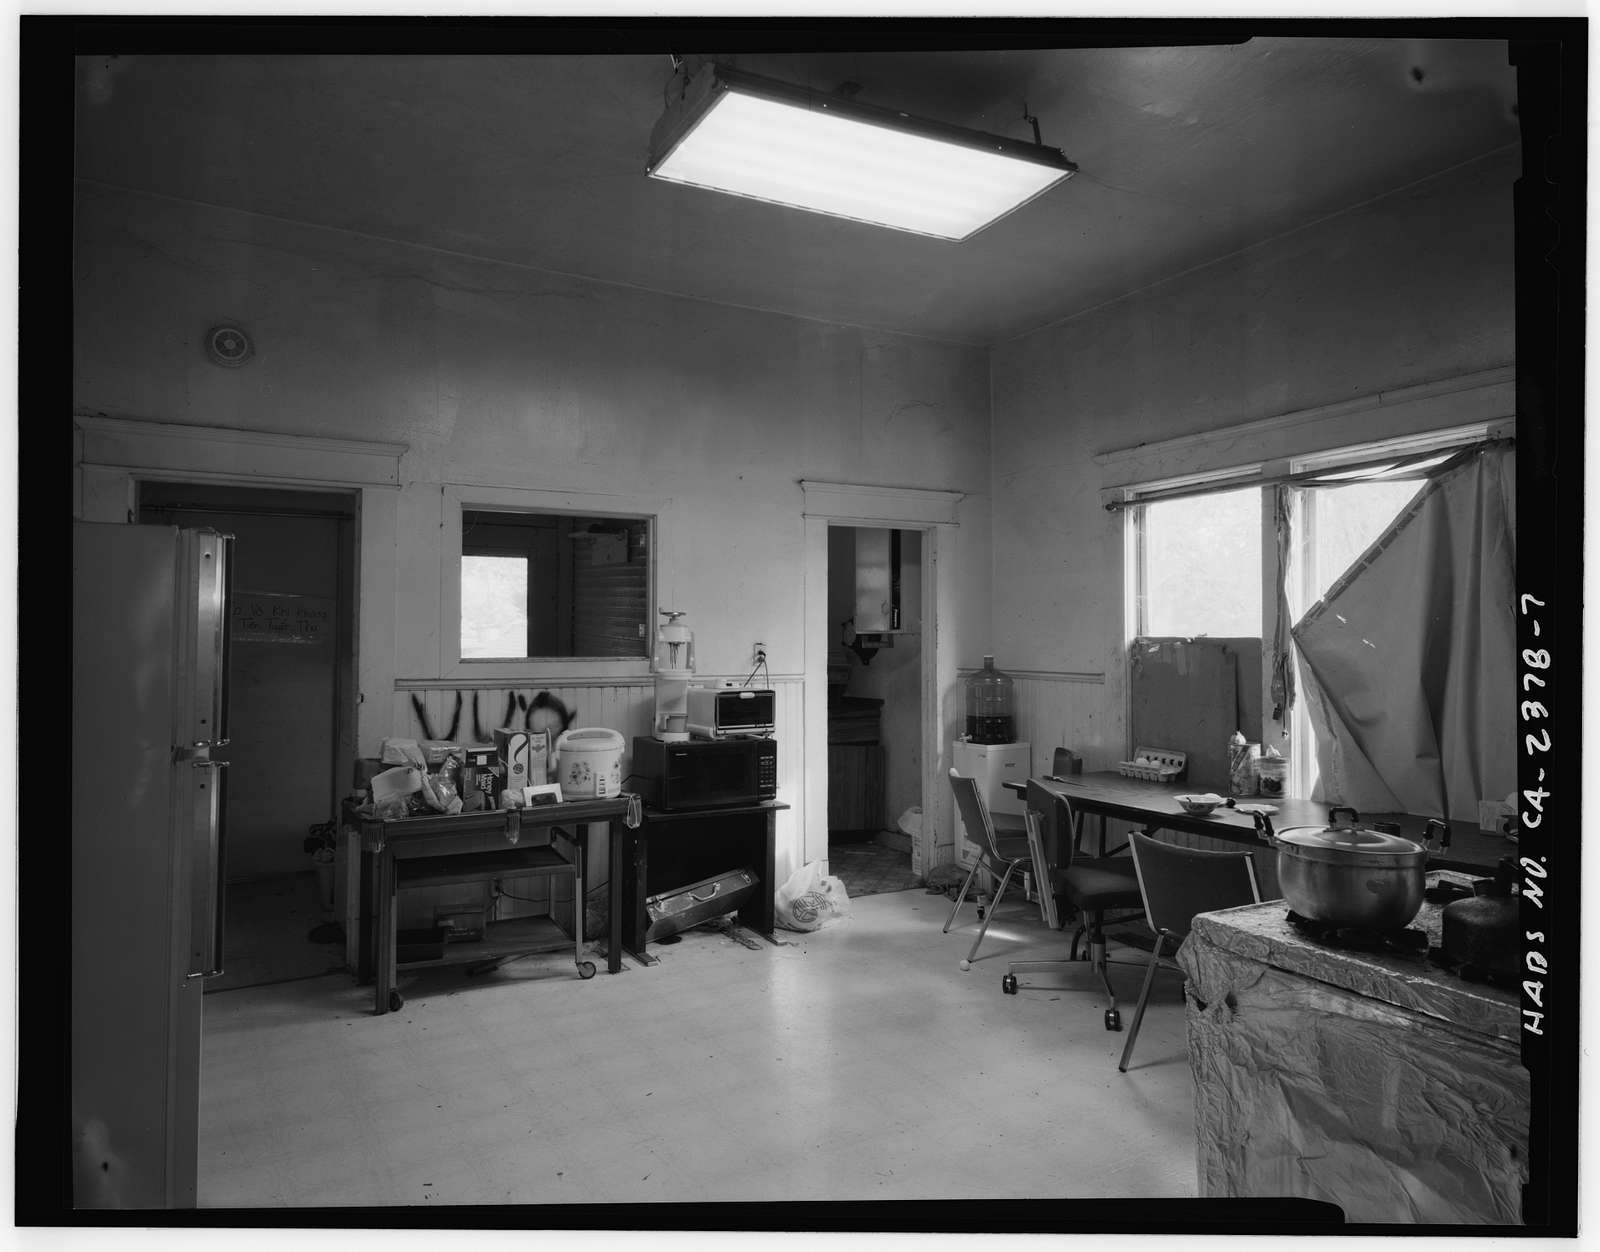 Antone Prola House, 148 North River Street, San Jose, Santa Clara County, CA